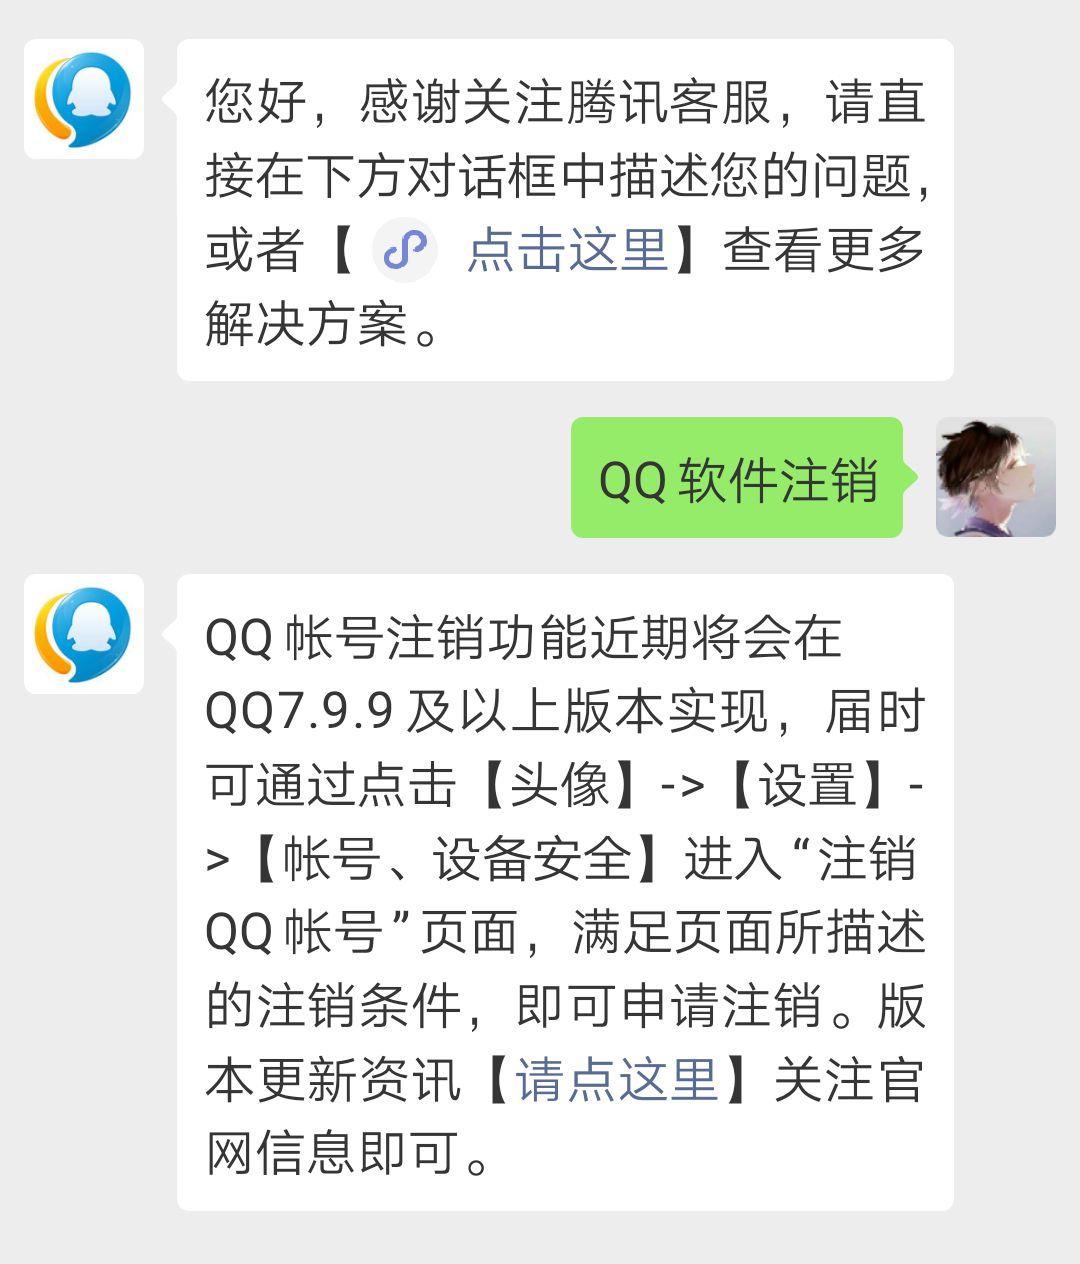 QQ即将正式上线注销功能 将会在QQ7.9.9上版本实现